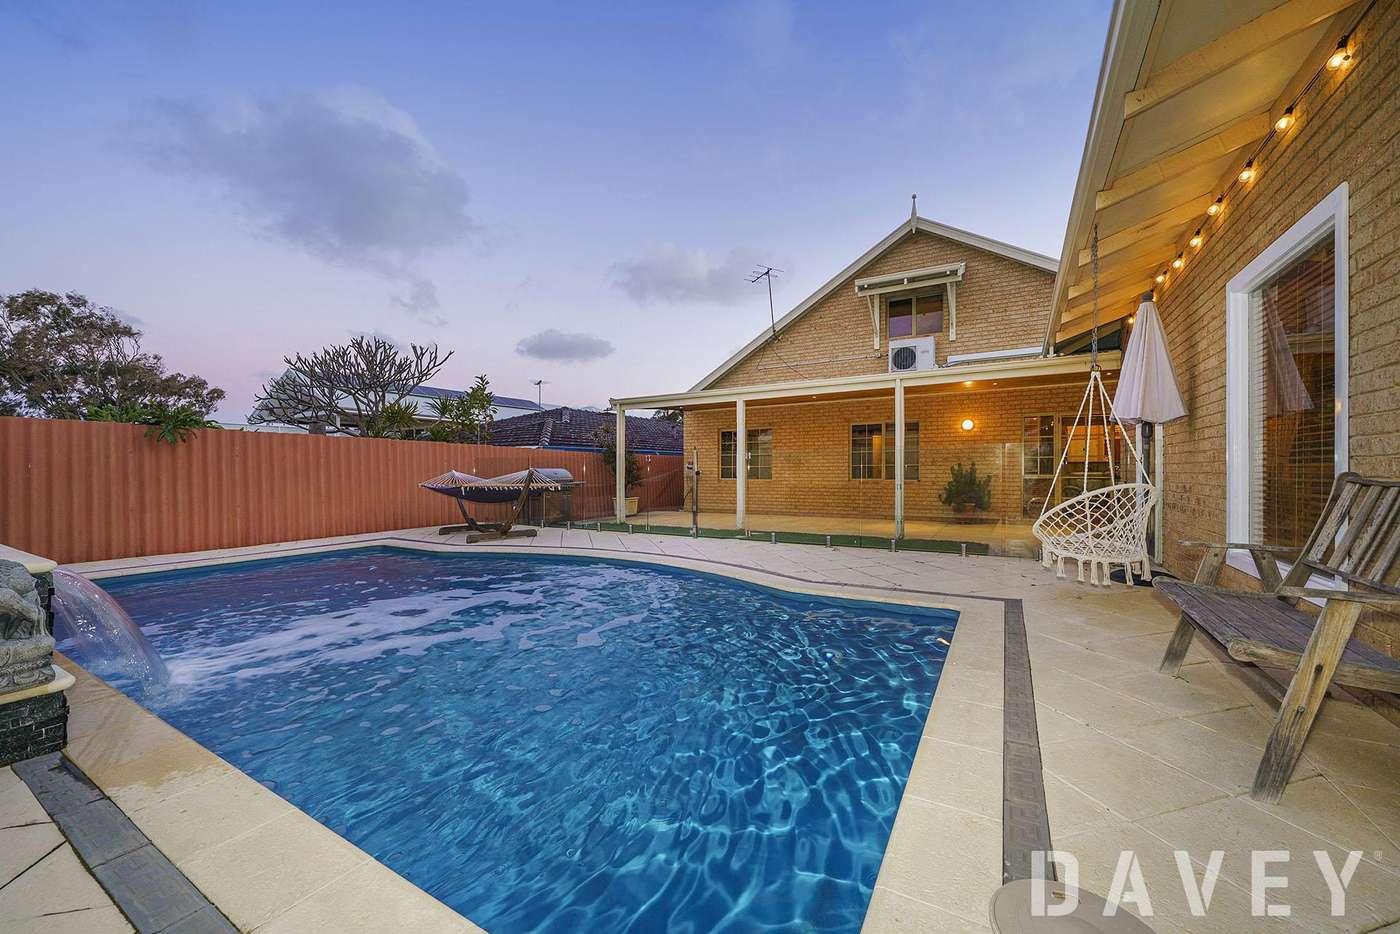 Main view of Homely house listing, 17 Barratt Street, North Beach WA 6020